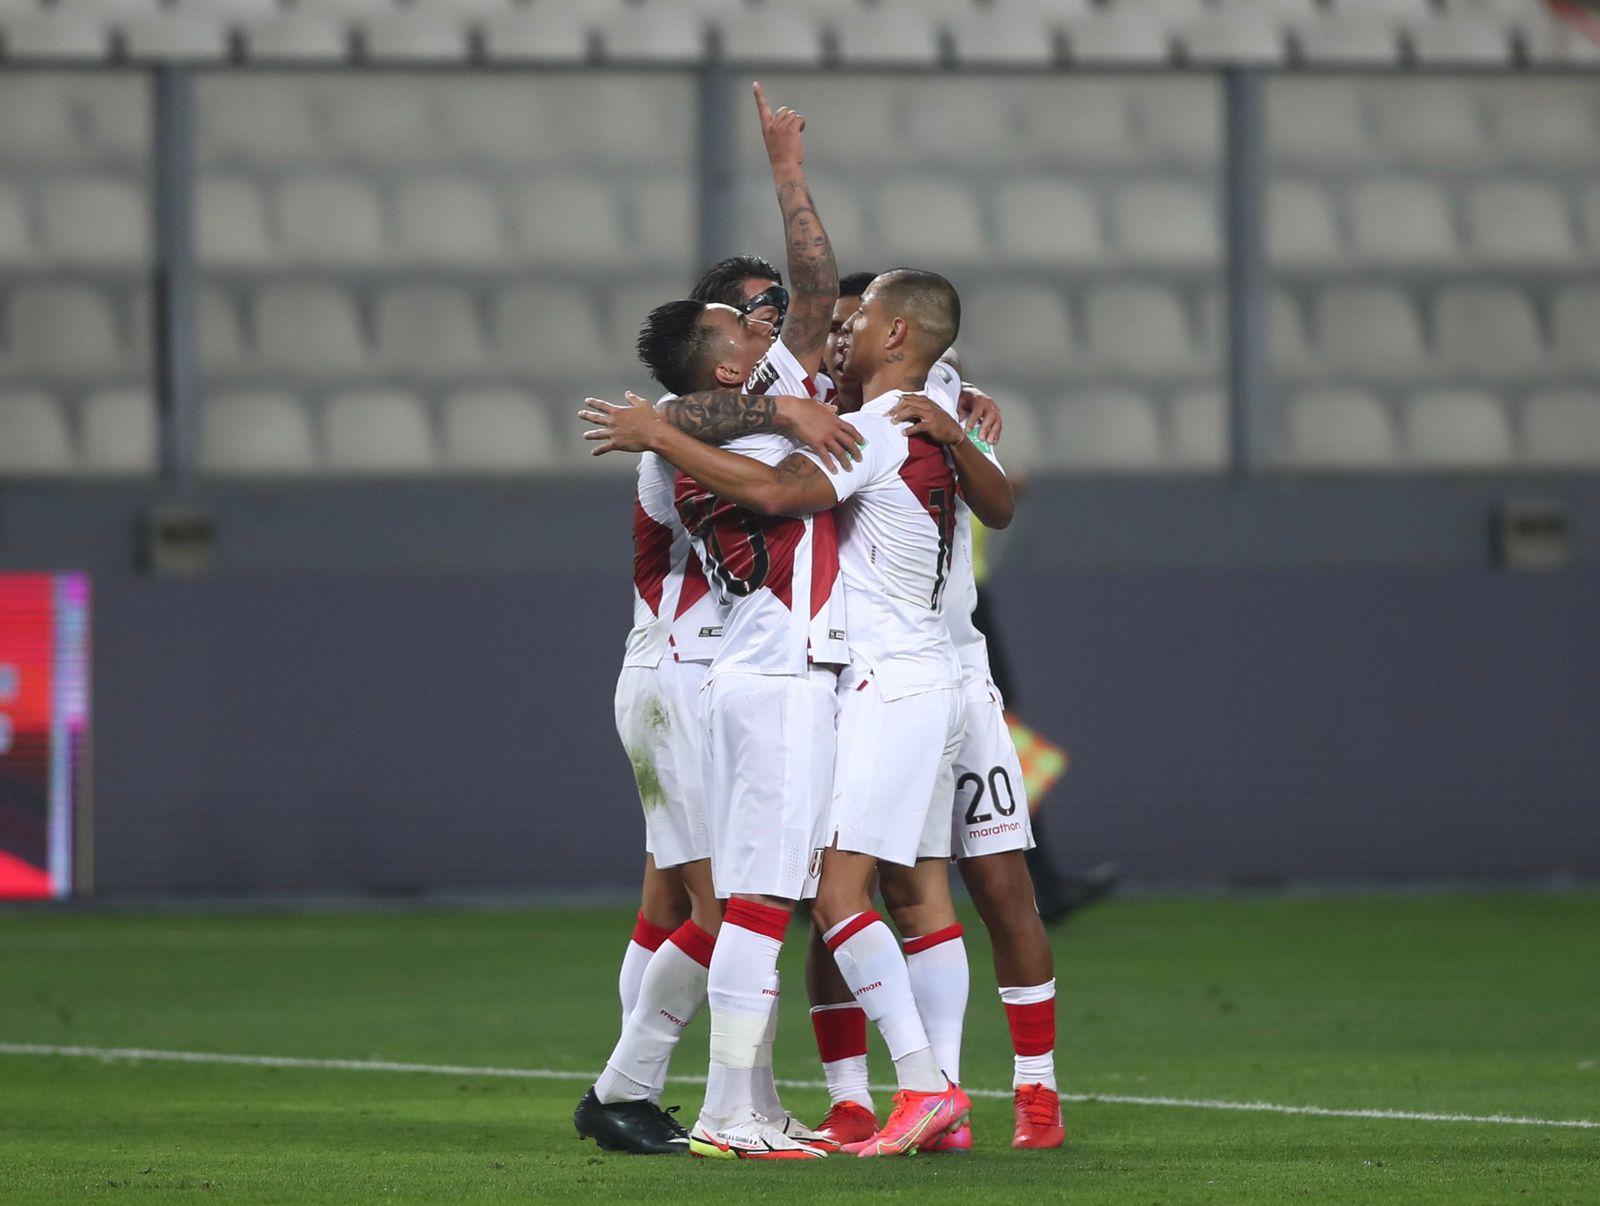 Perú vs Venezuela 1-0 Jornada 6 Eliminatorias CONMEBOL 2022